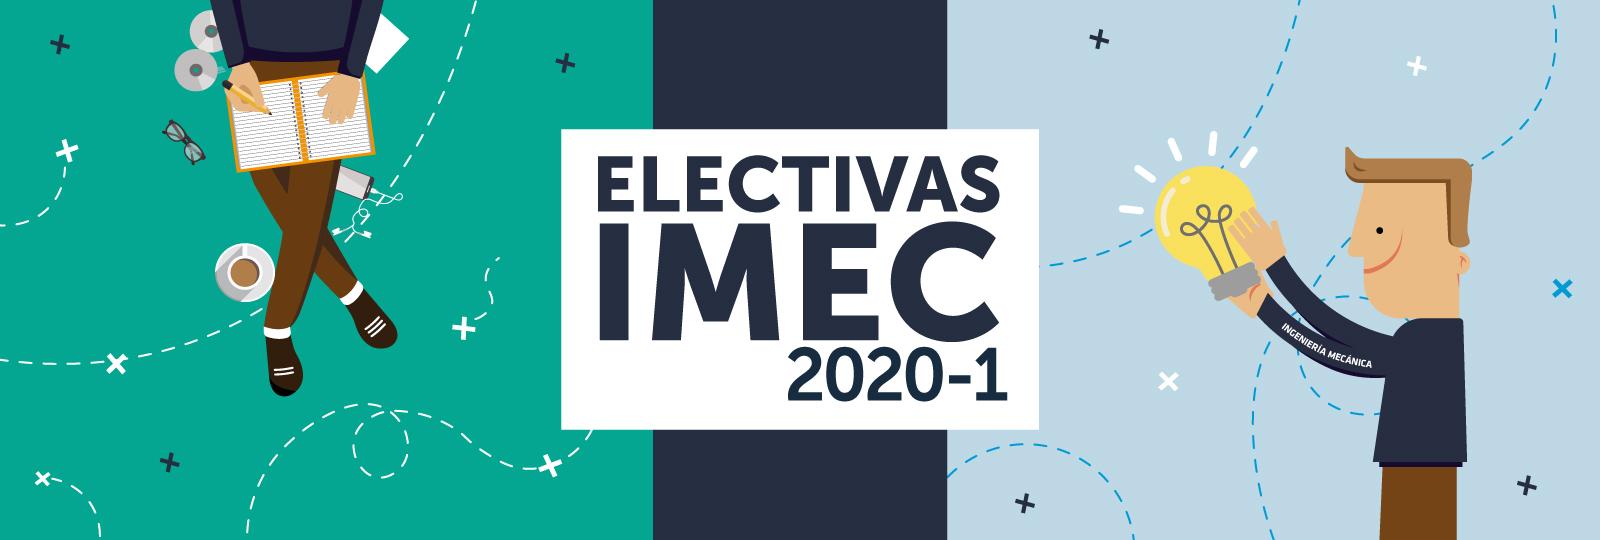 Electivas IMEC 2020-1